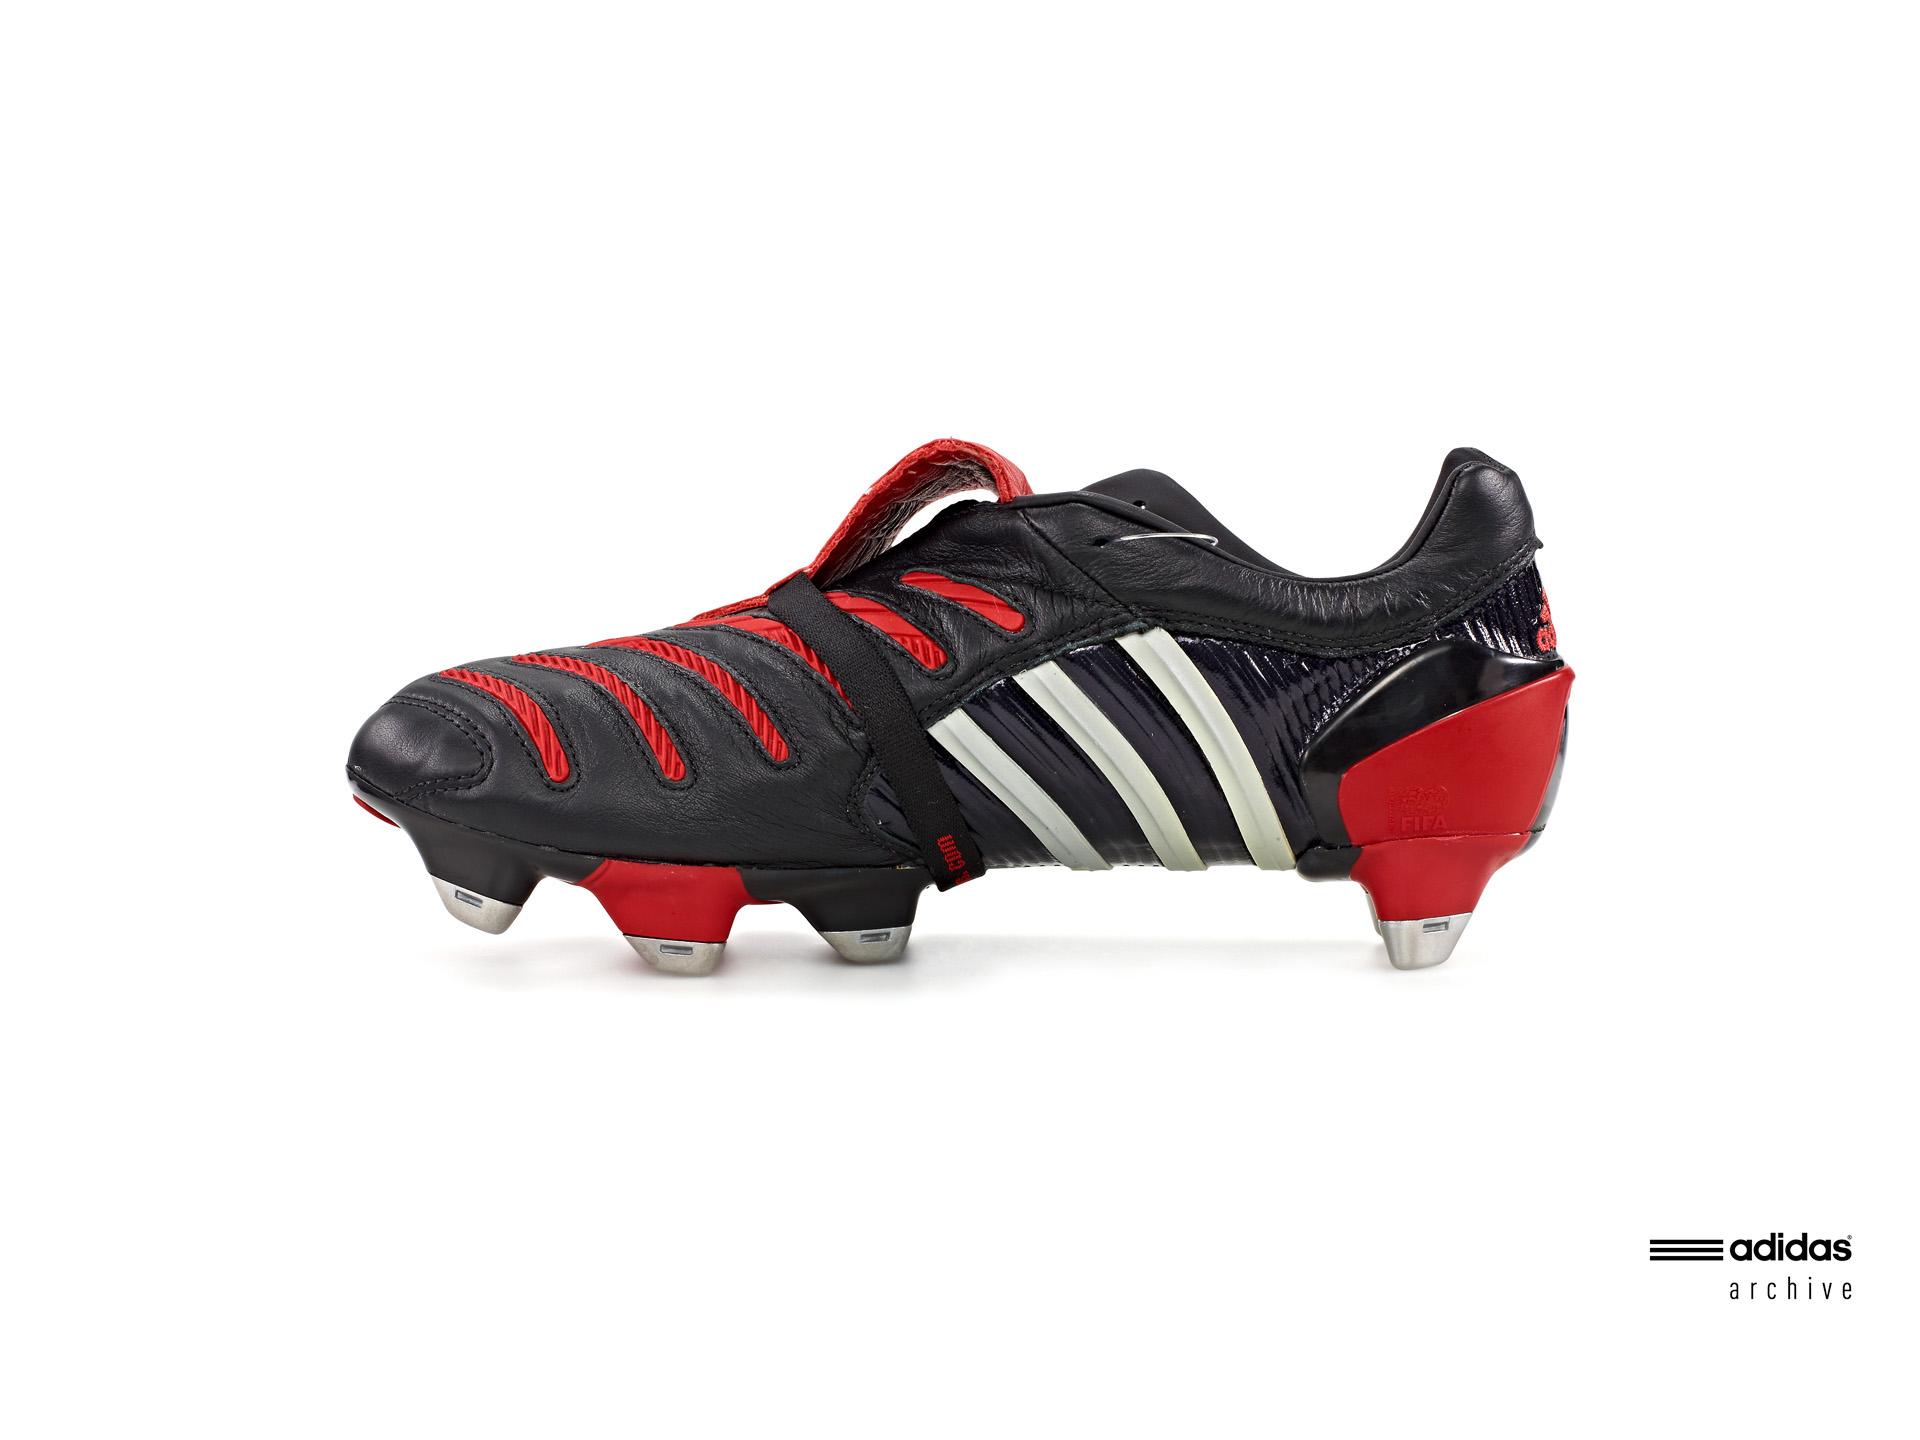 utilizar daño Polémico  Adidas Predator: Every edition of the world-famous boot   Goal.com